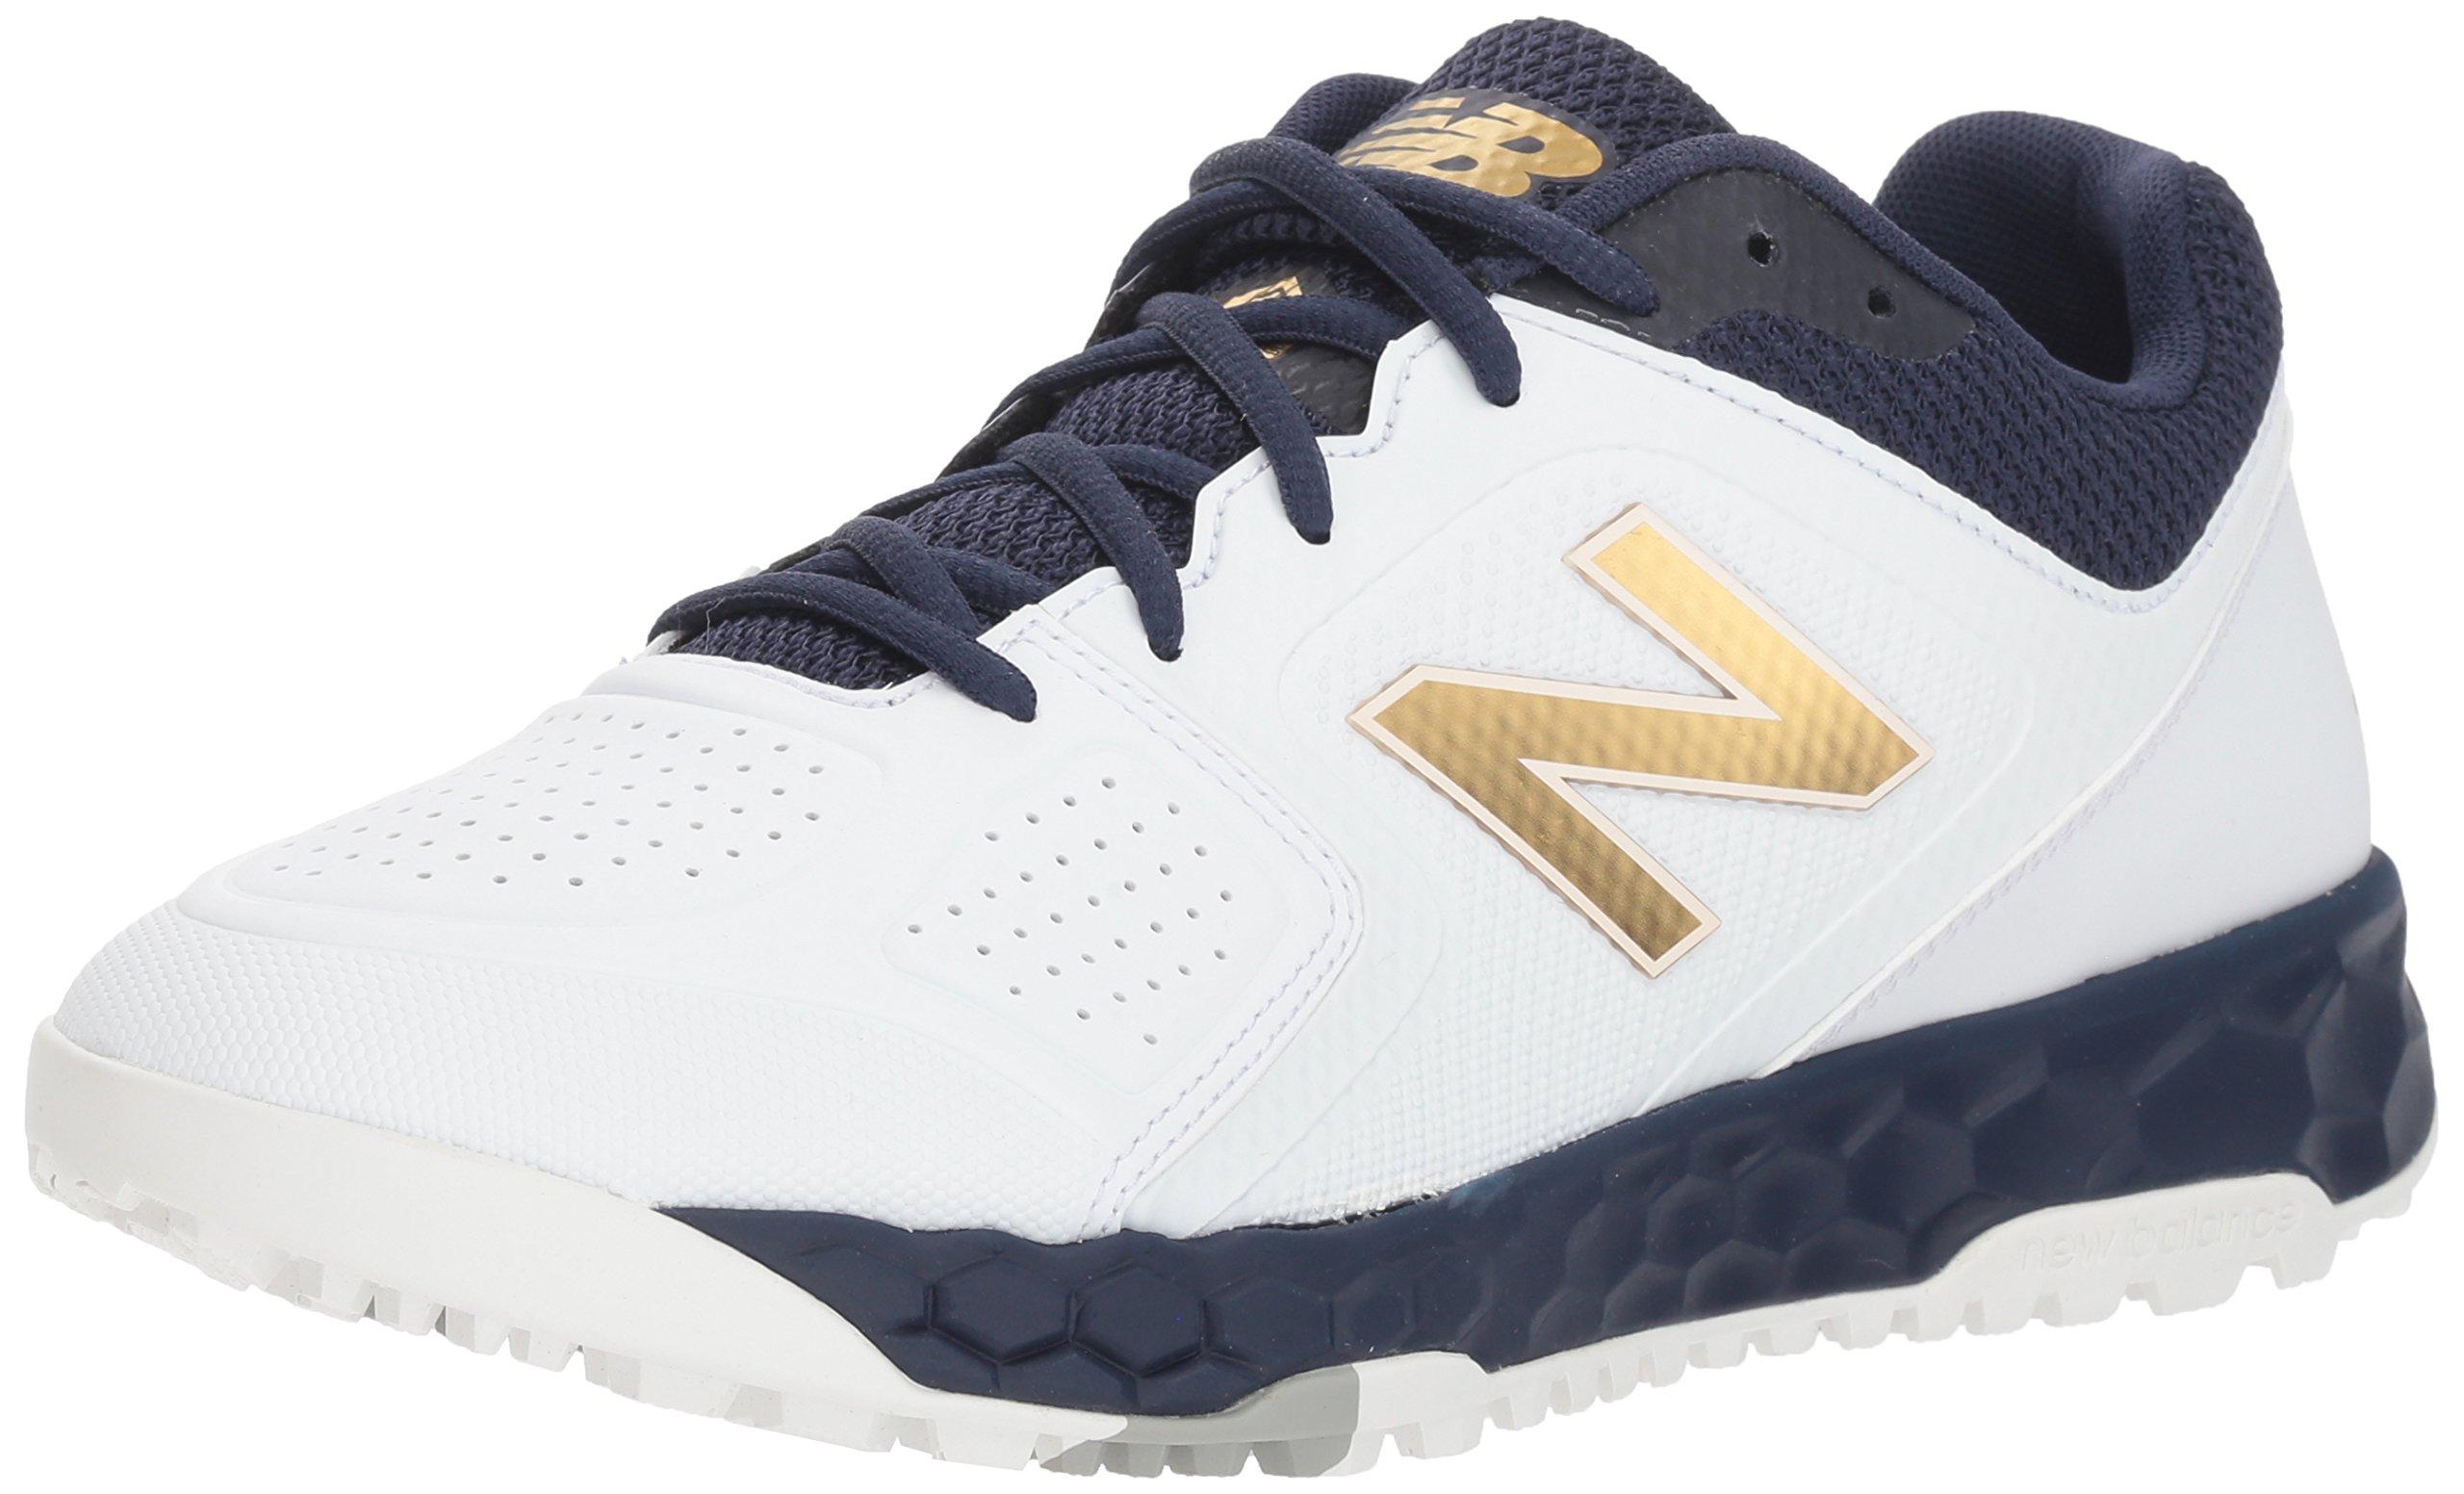 New Balance Women's Velo V1 Turf Softball Shoe, Navy/White, 6.5 B US by New Balance